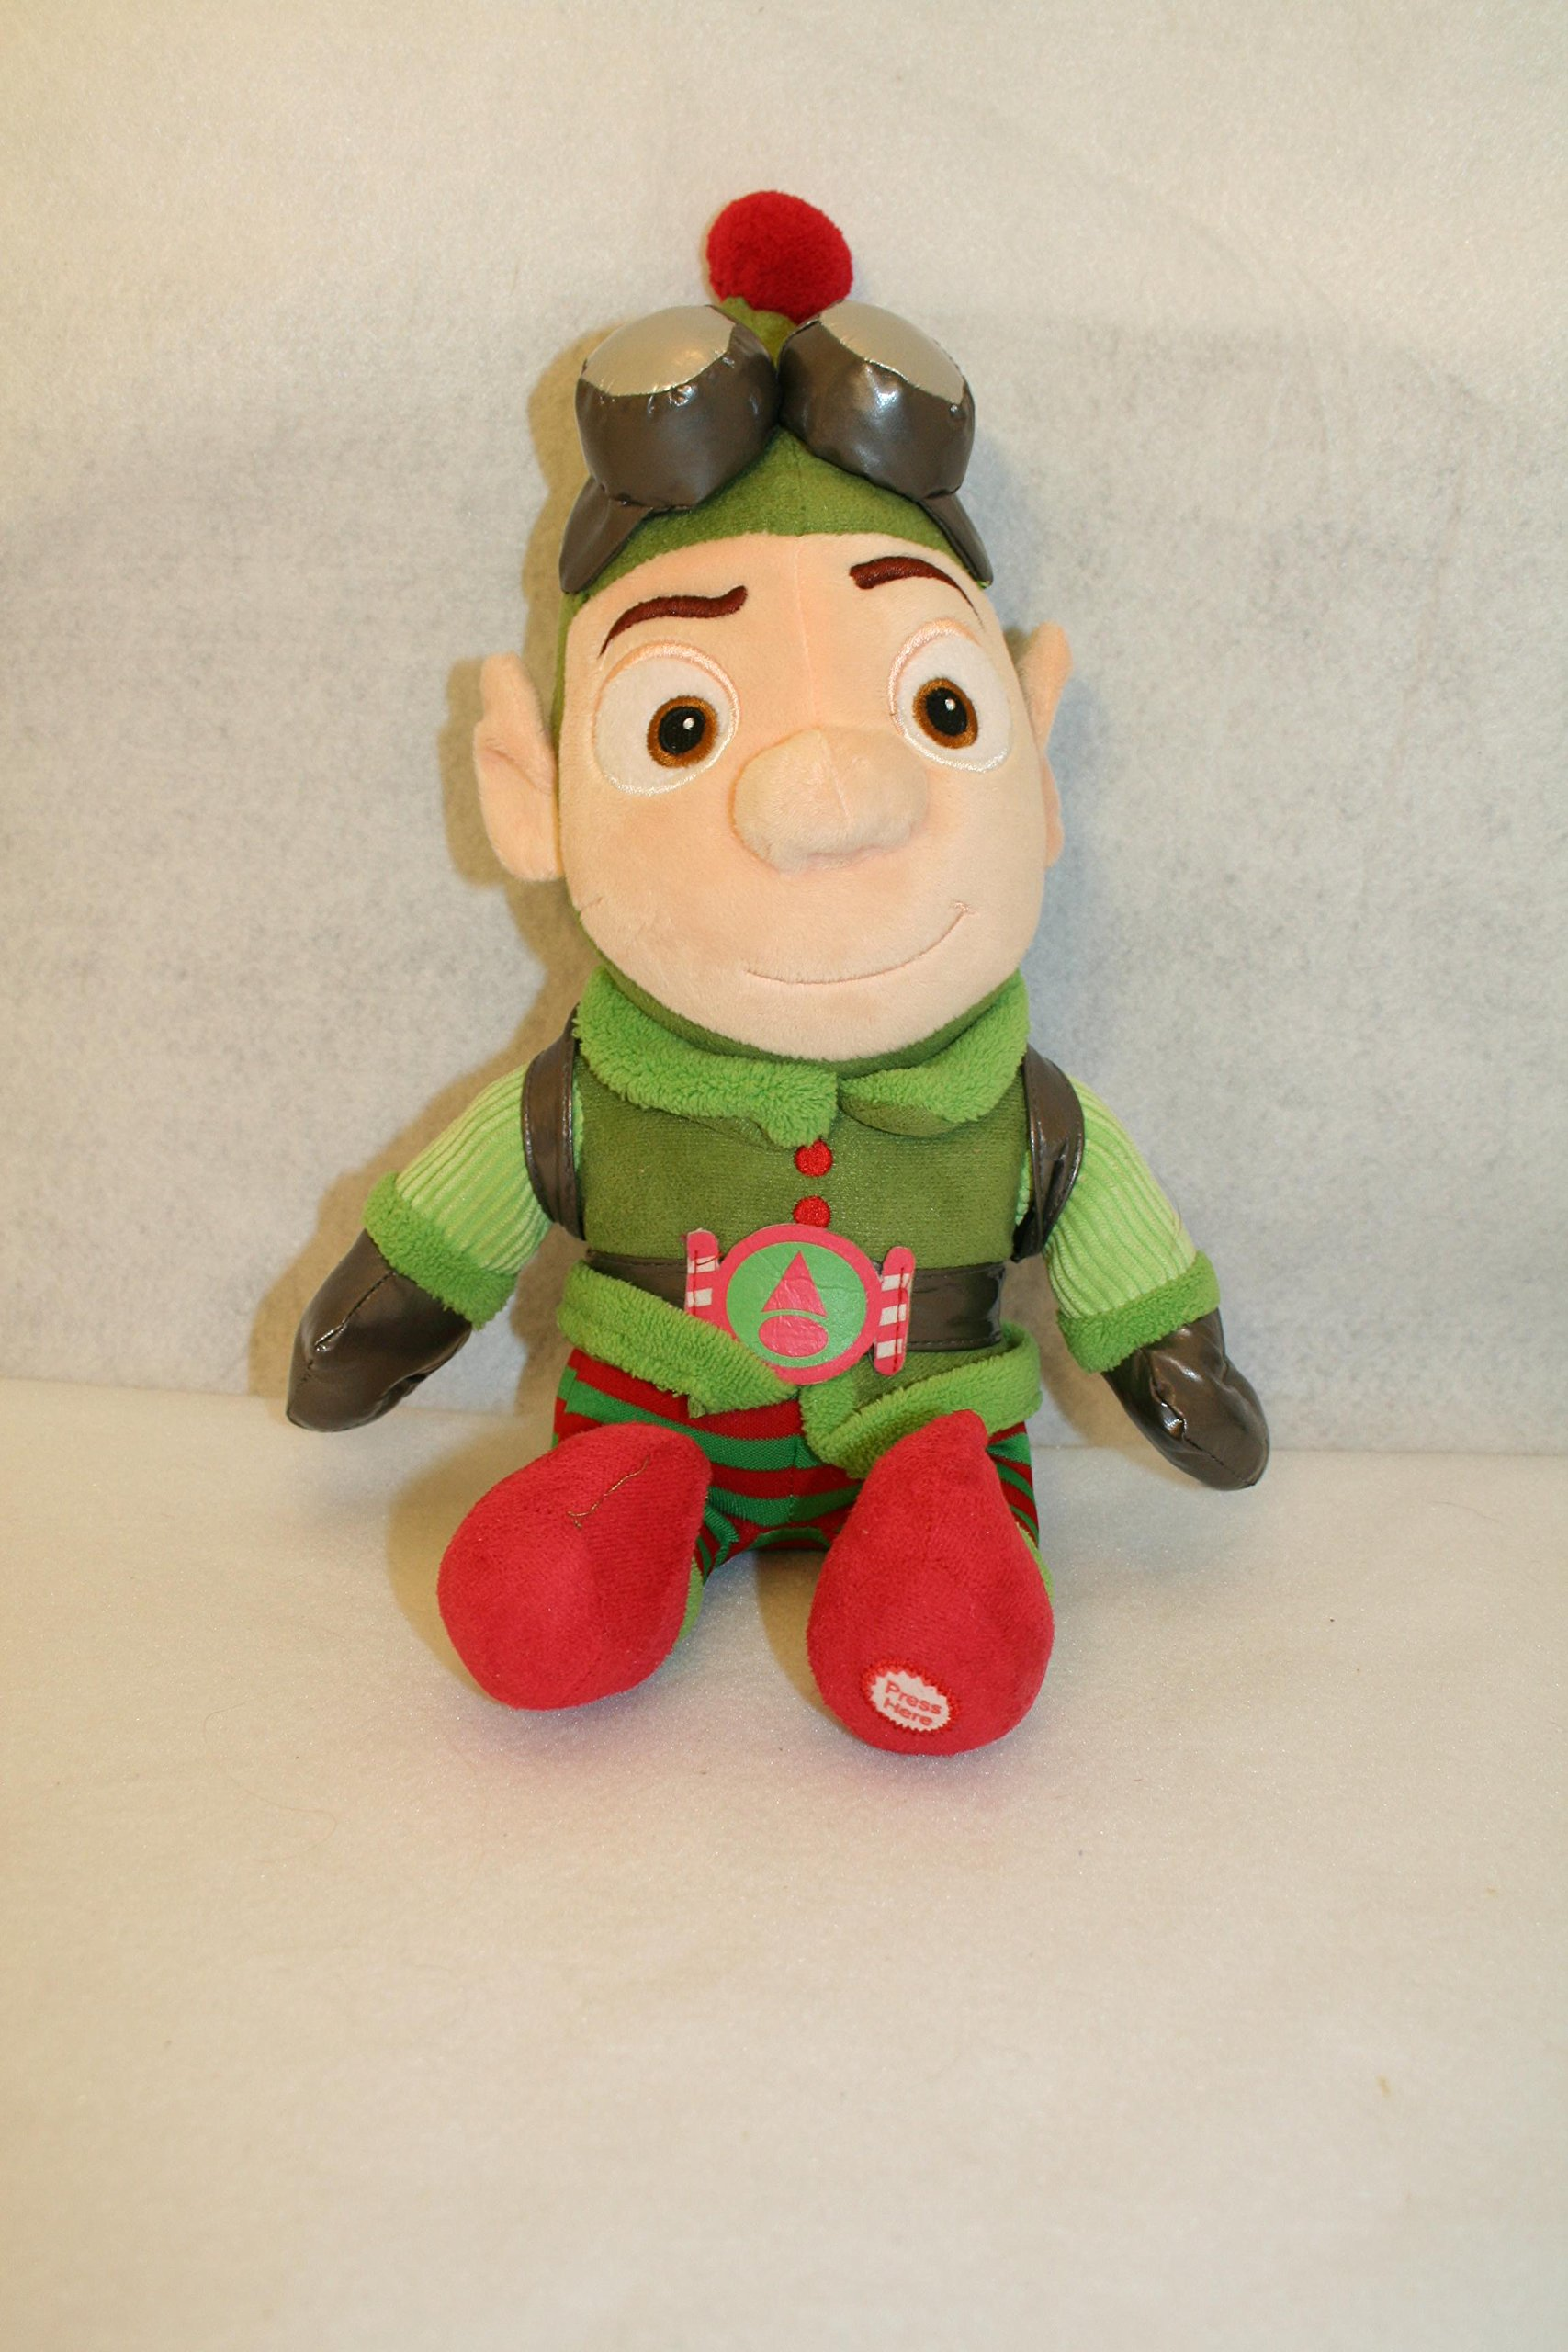 Hallmark Disney's Prep & Landing Wayne the Elf Feature's Sound